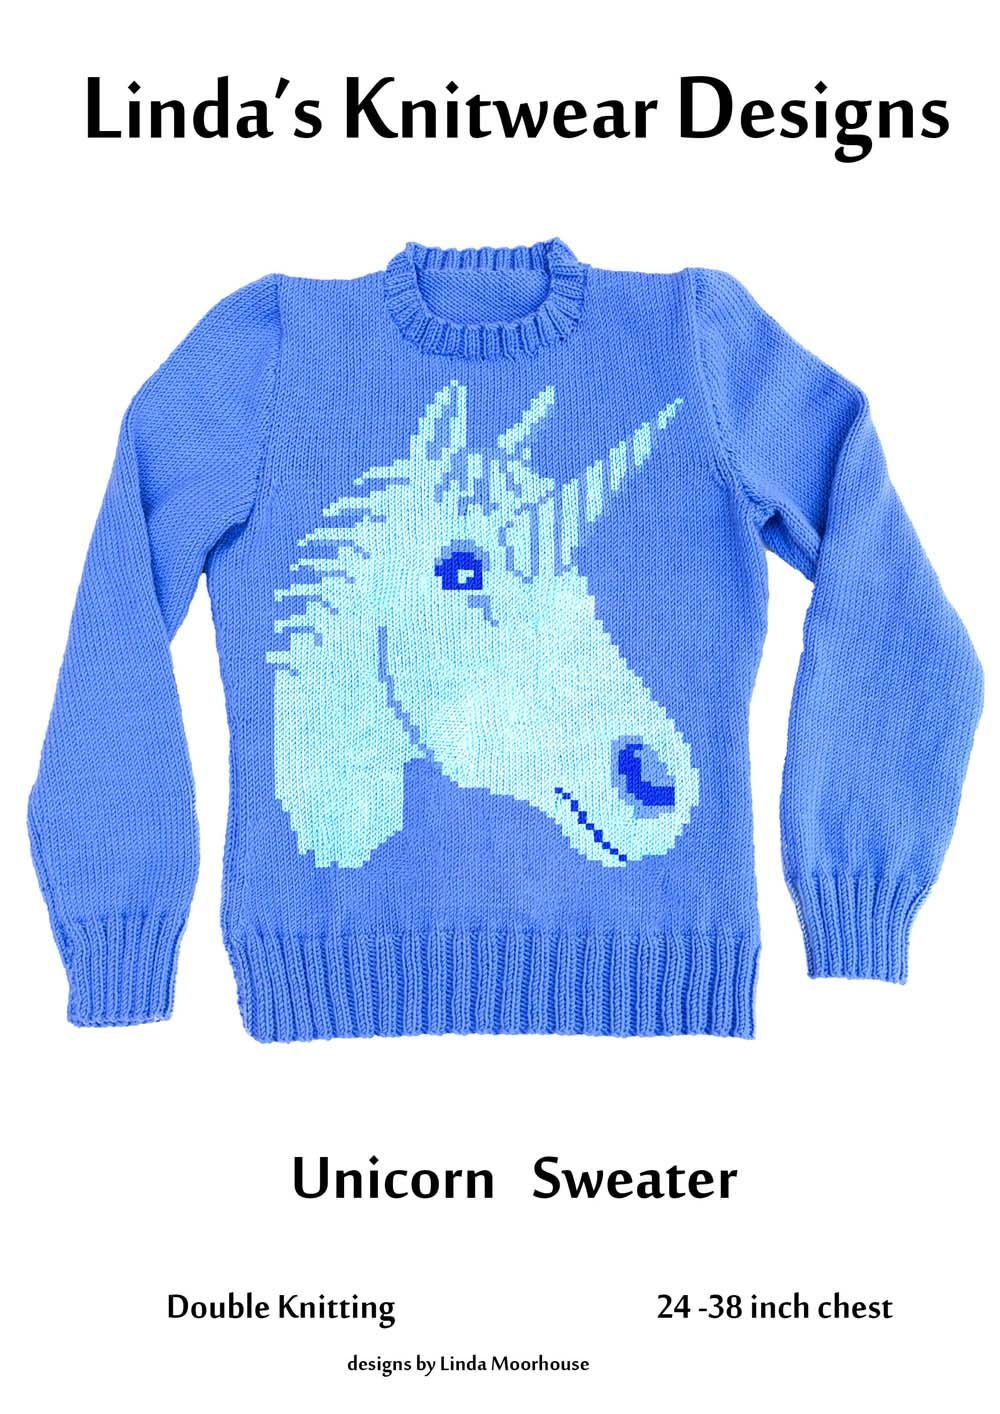 cb6c89019 Unicorn motif sweater knitting pattern - PDF download - Children s ...